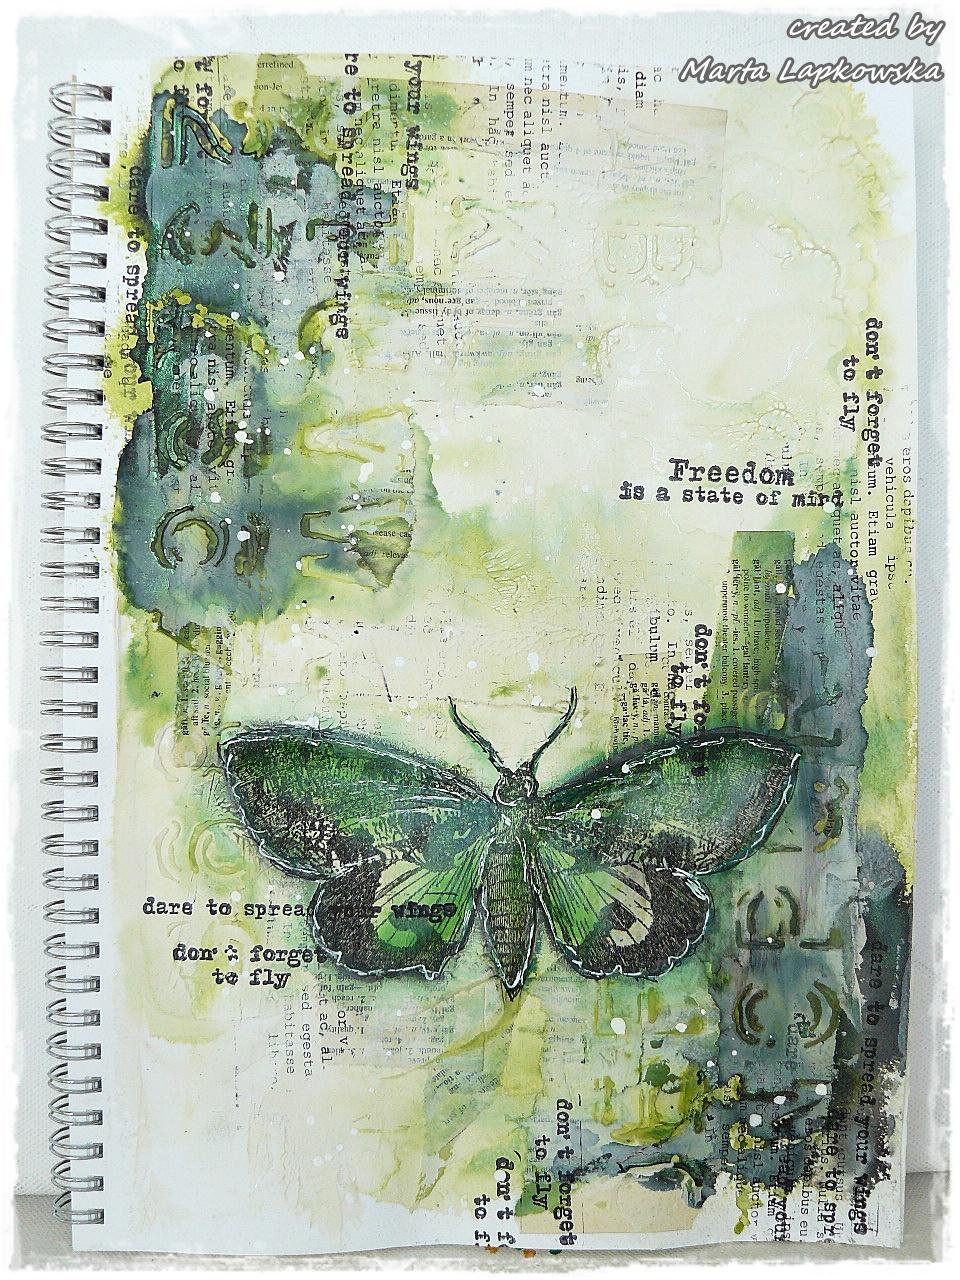 Art Journal Calendar Tutorial : Marta lapkowska freedom of moth journal page video